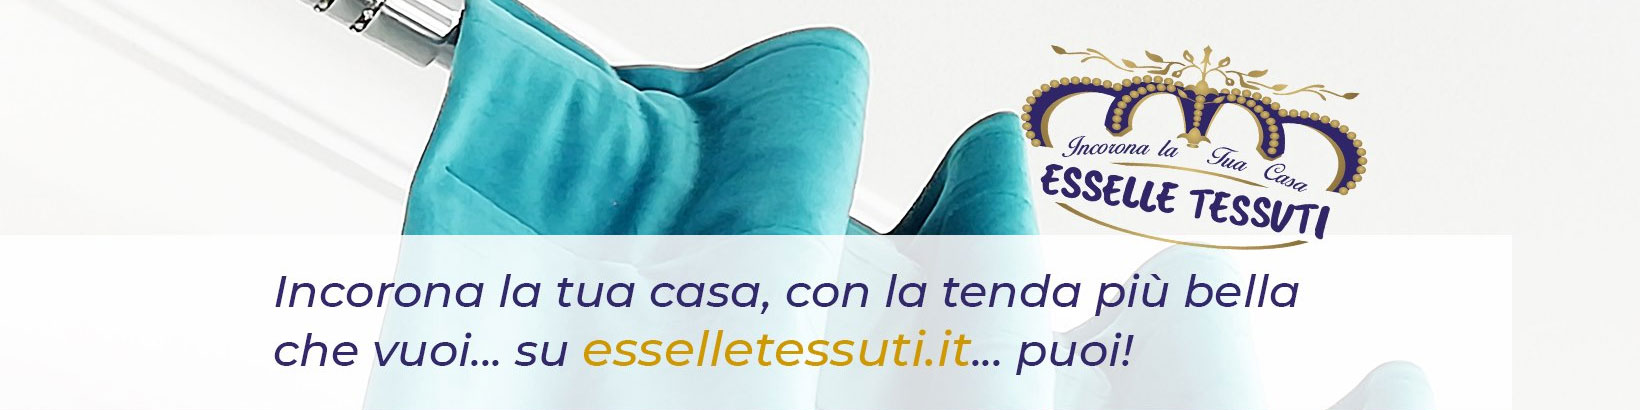 Tende e tessuti al metro in vendita online: offertissime!